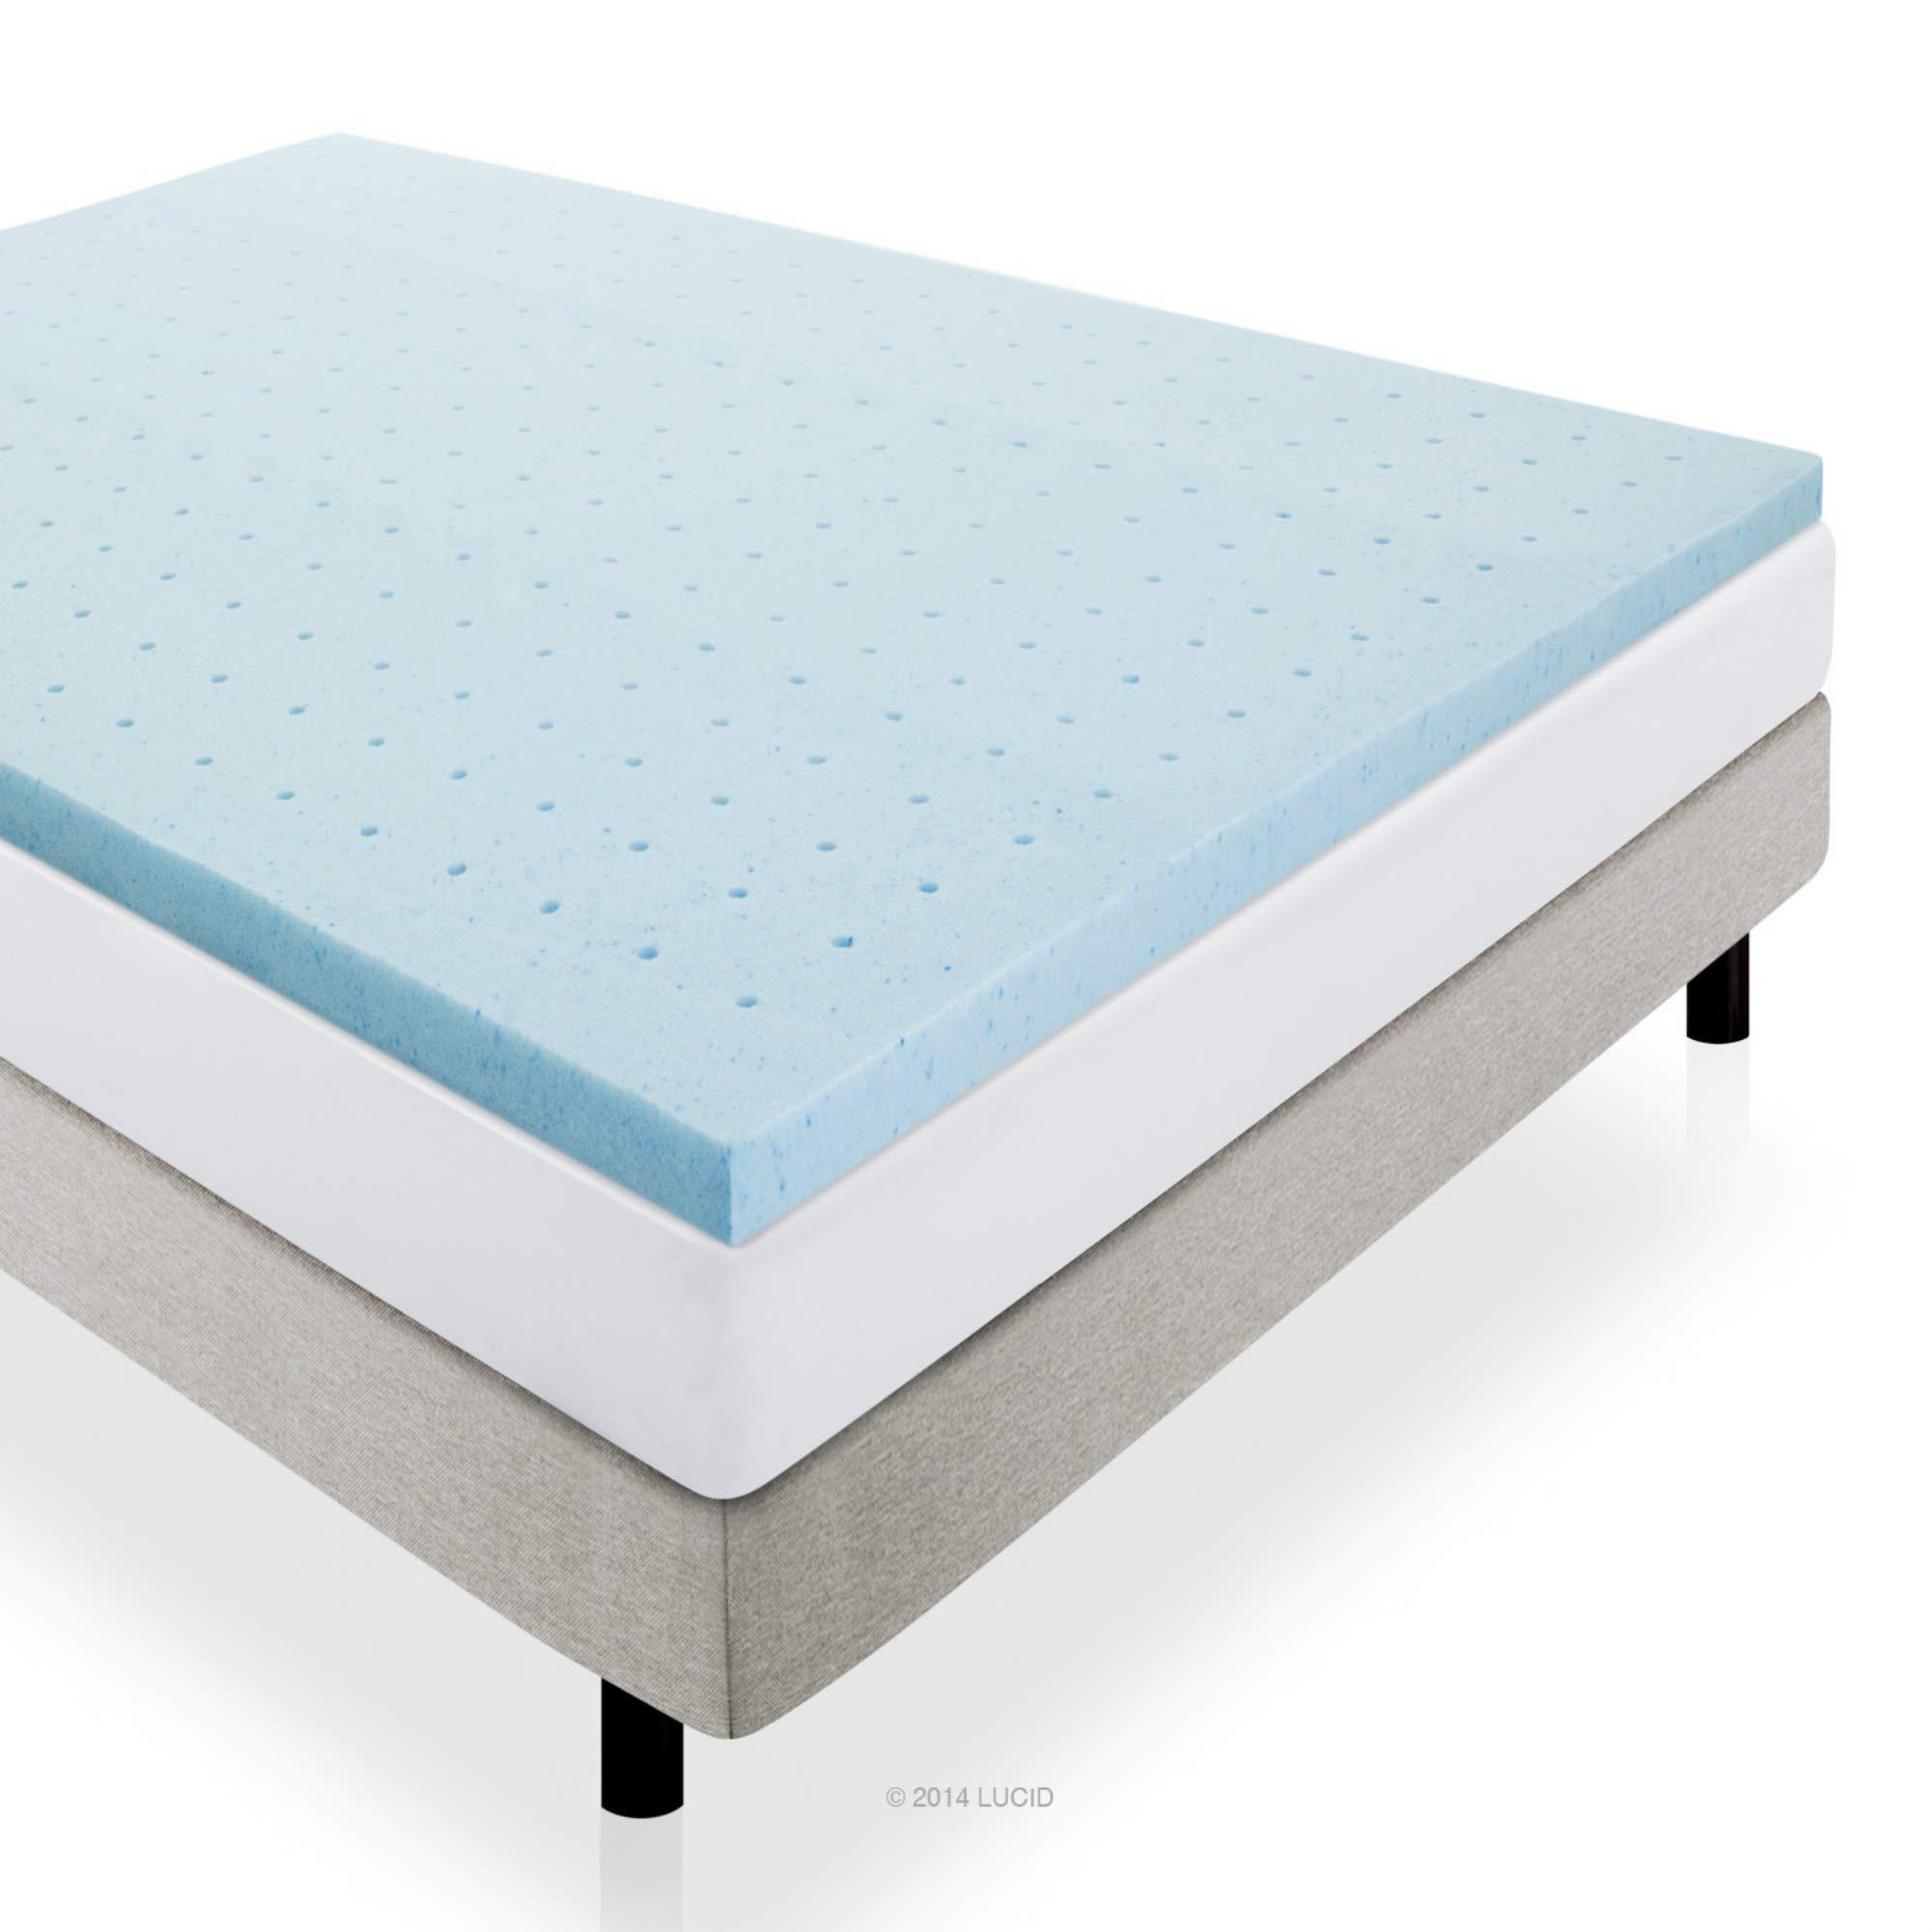 LUCID 2'' Gel Infused Ventilated Memory Foam Mattress Topper, Twin X-Large